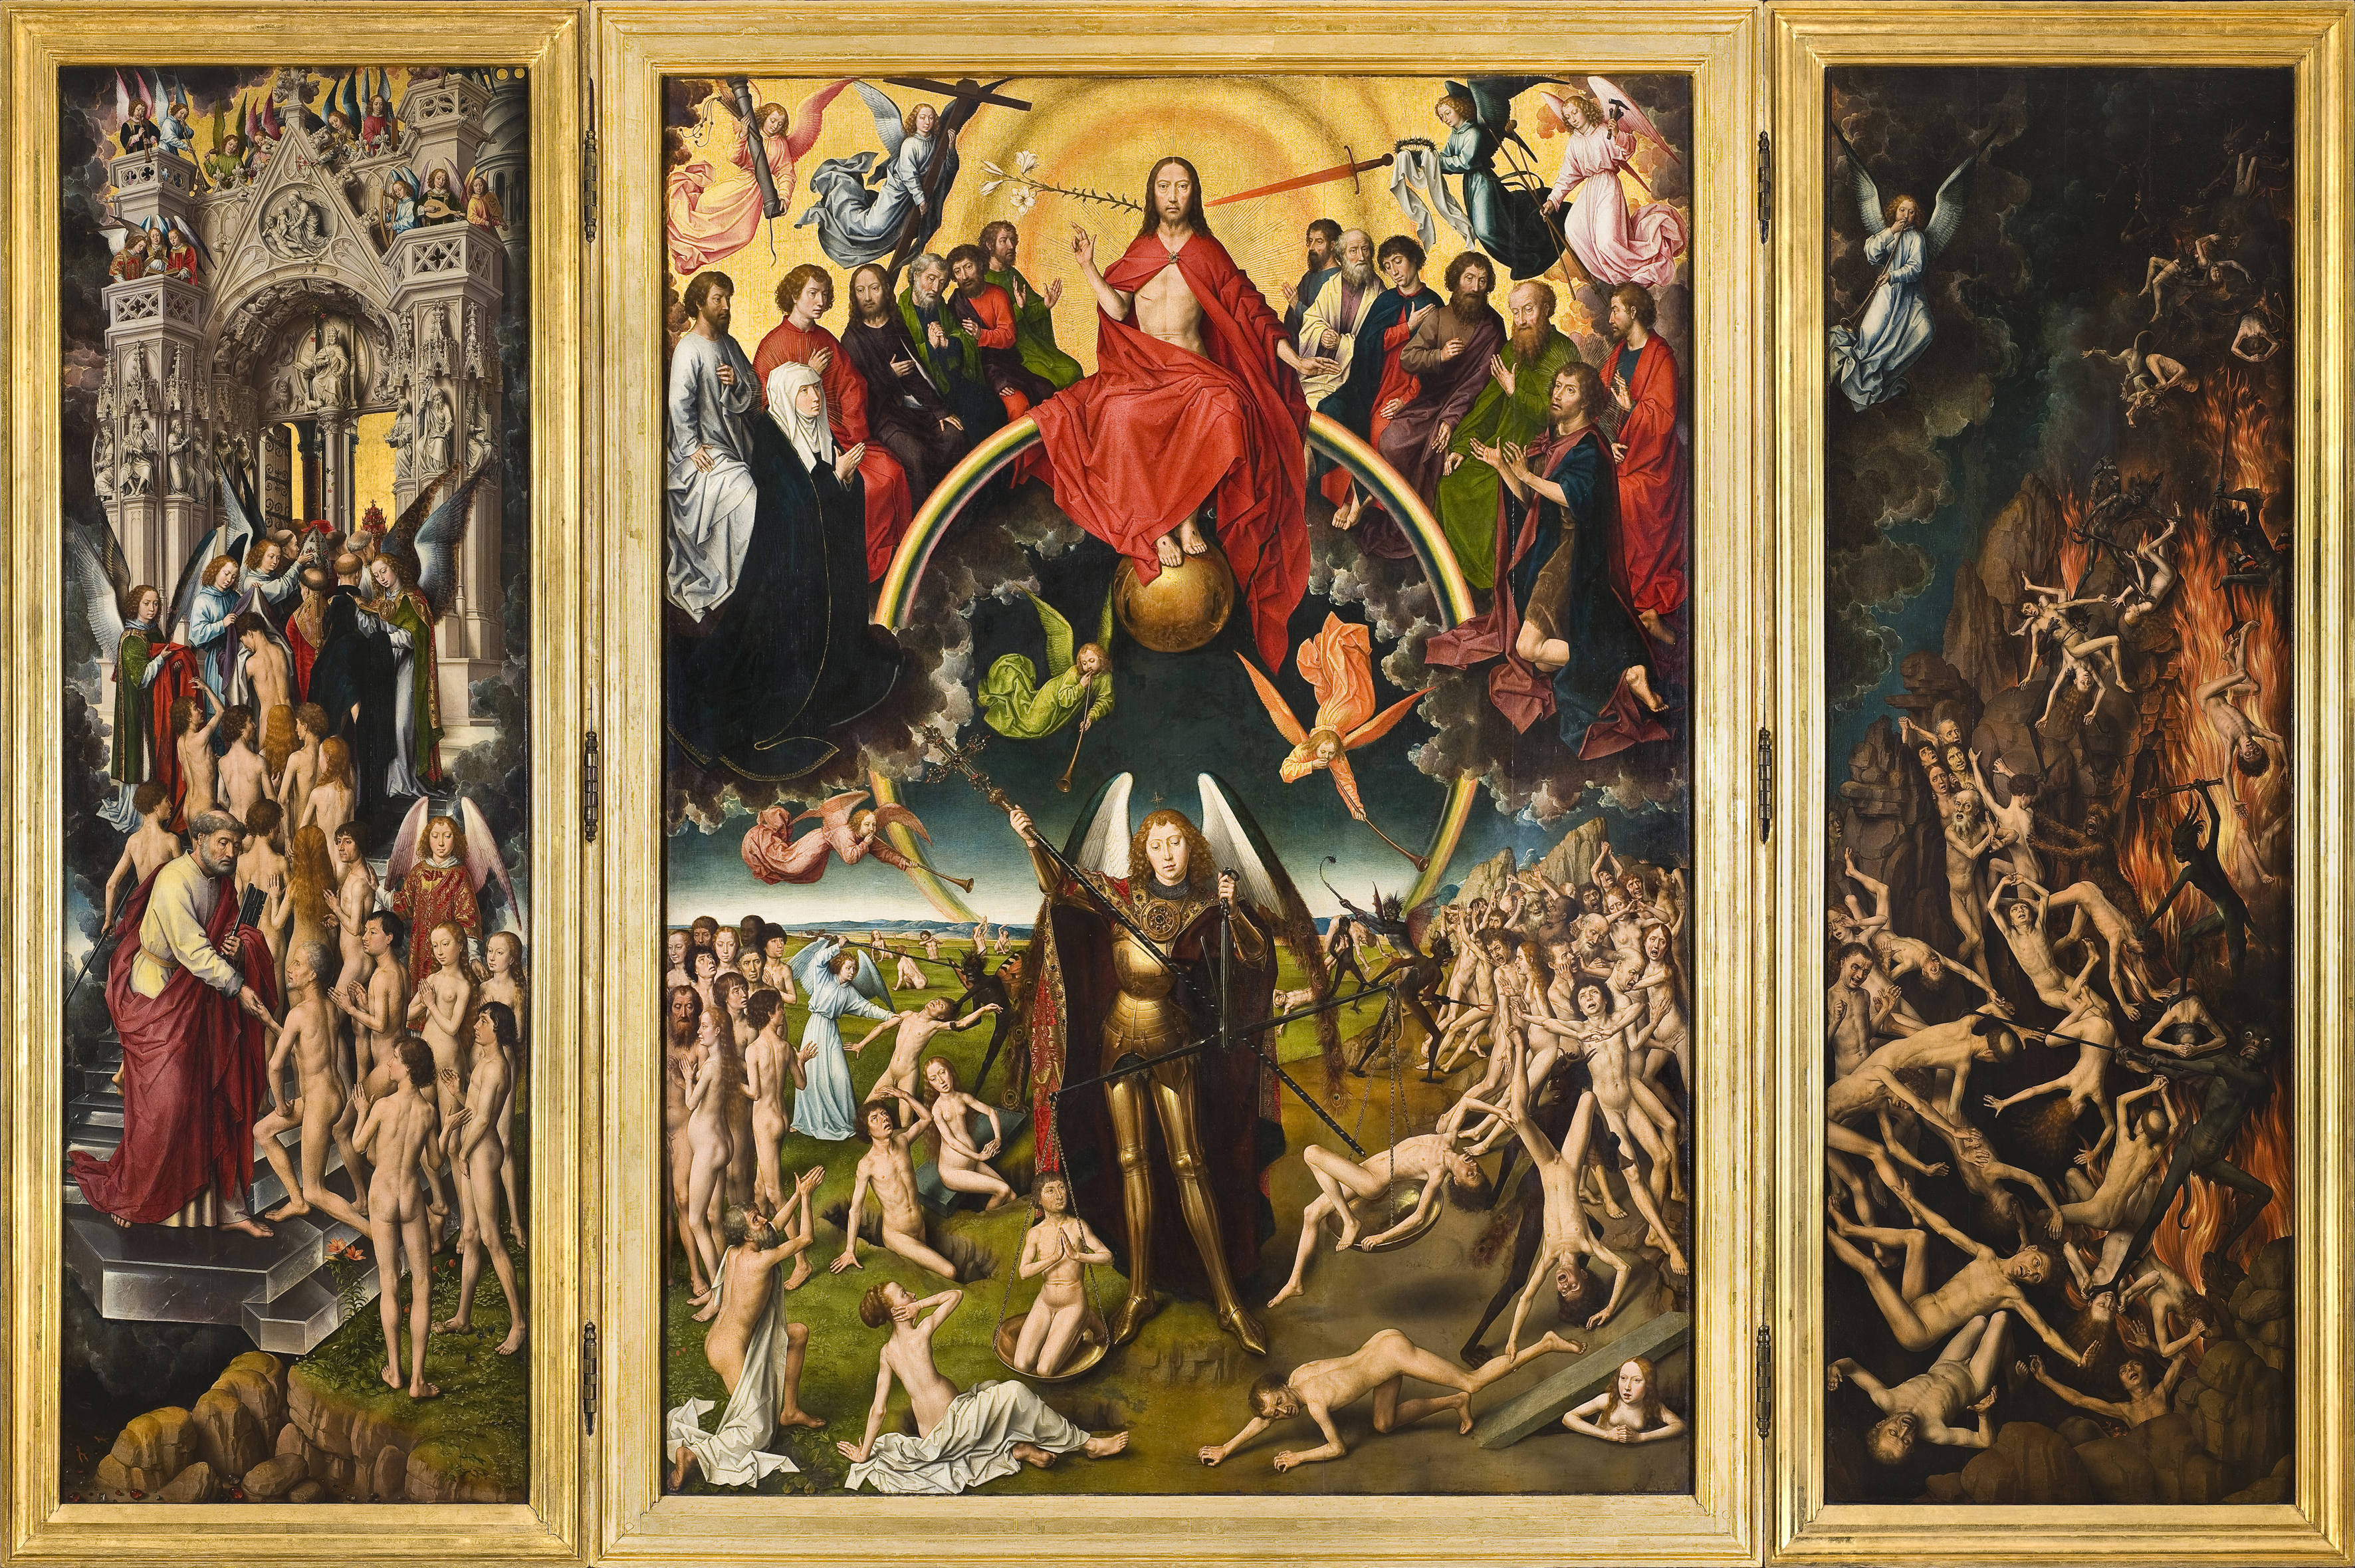 obraz Hansa Memlinga